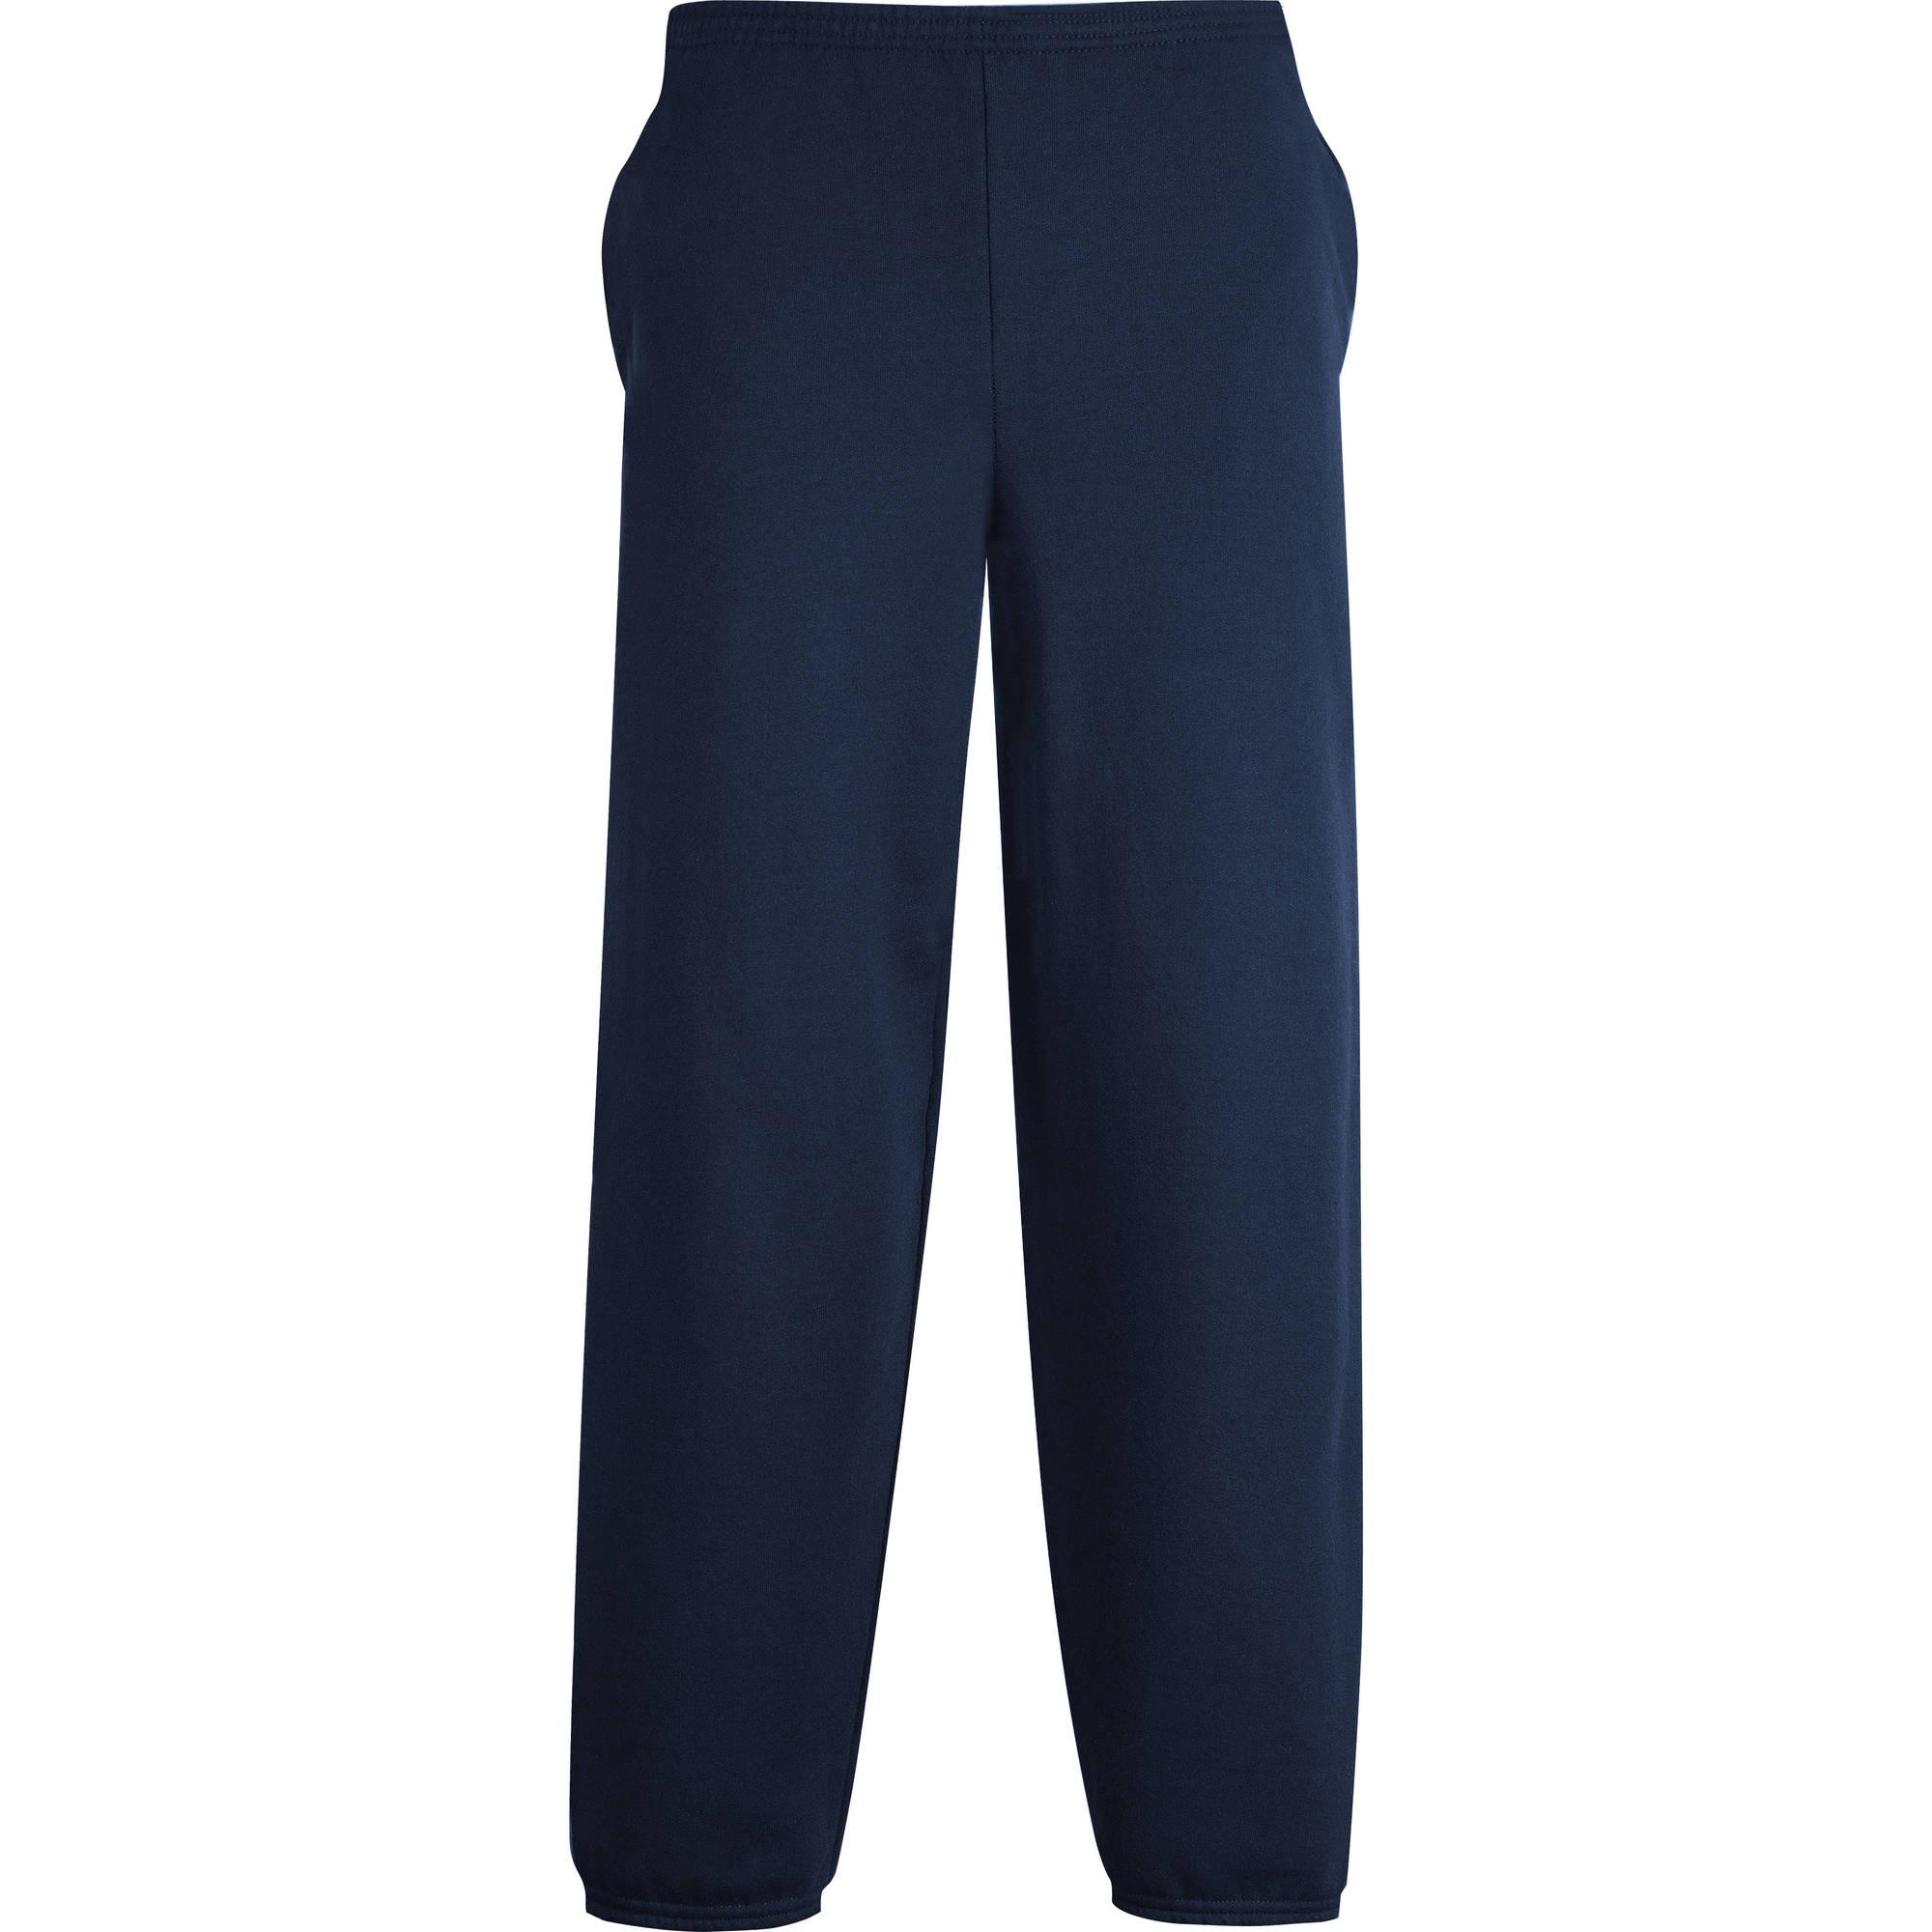 Hanes Boys' Fleece Pant